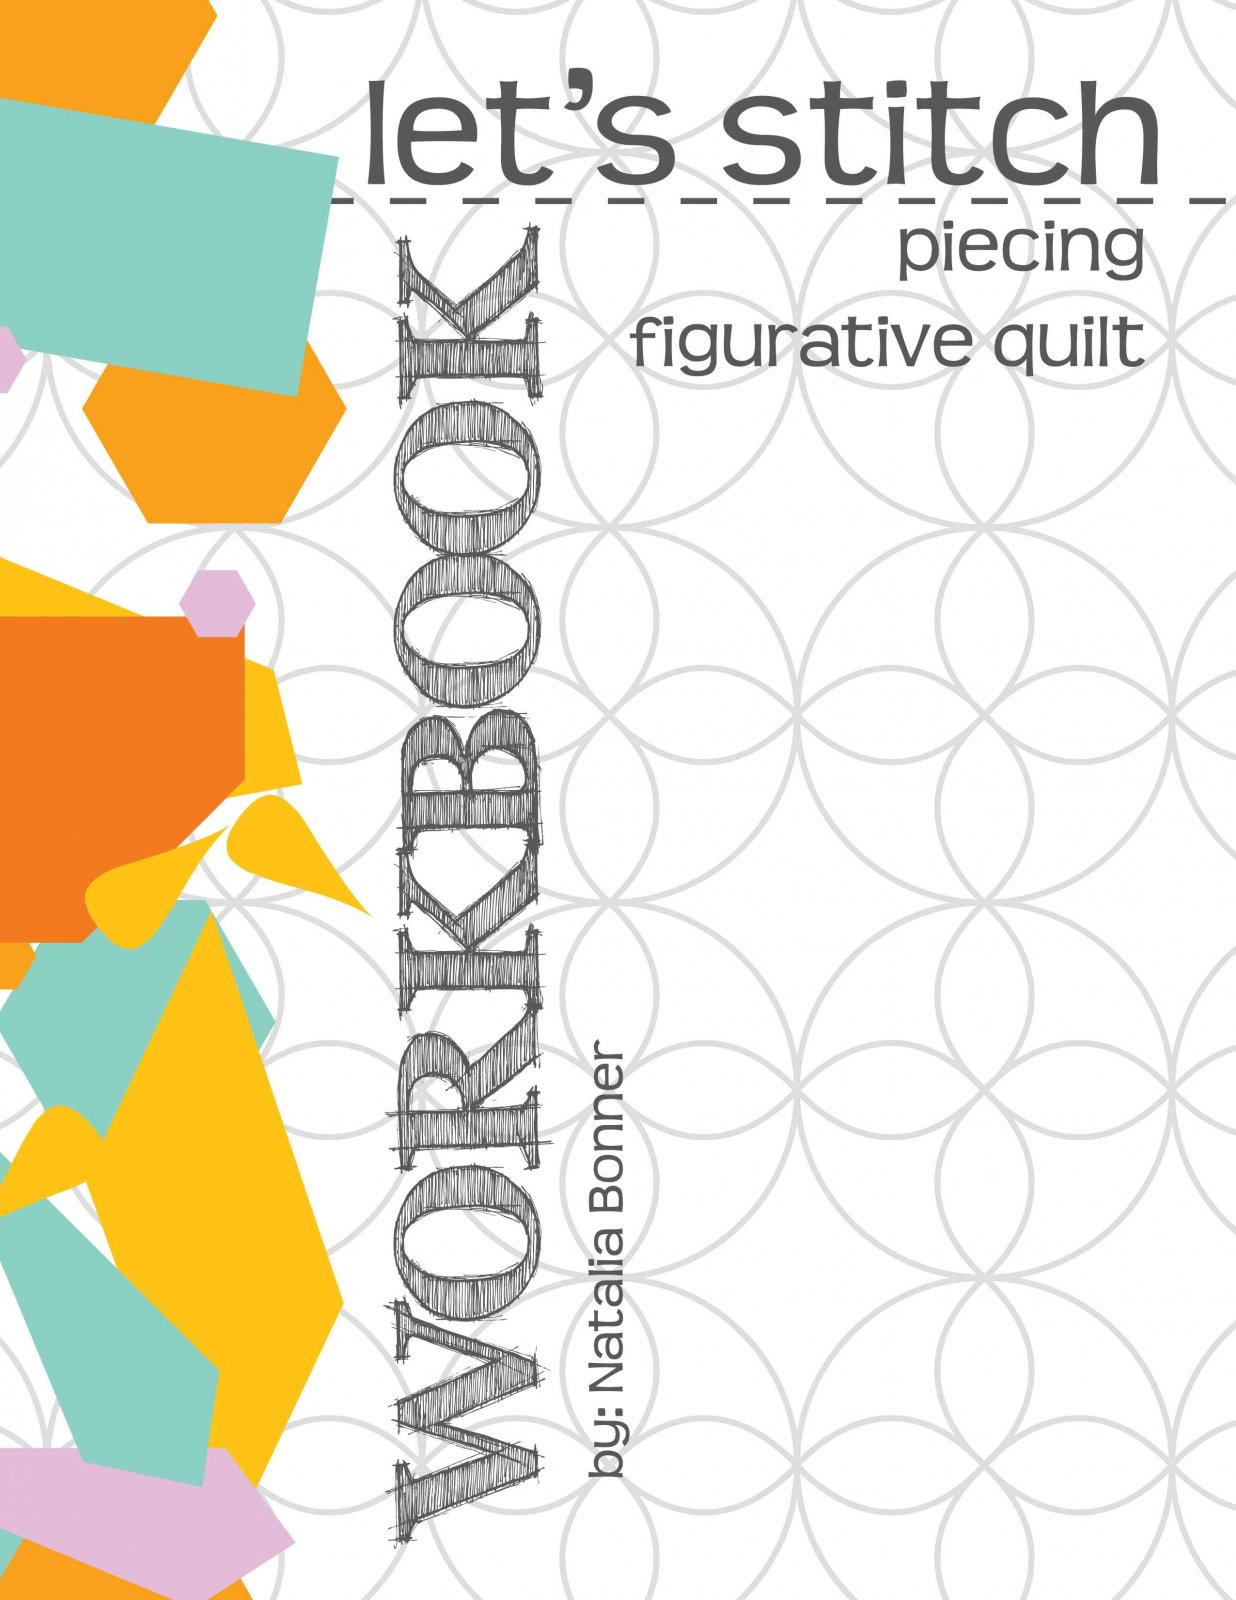 Let's Stitch a Figurative Quilt - Piecing Workbook - PDF